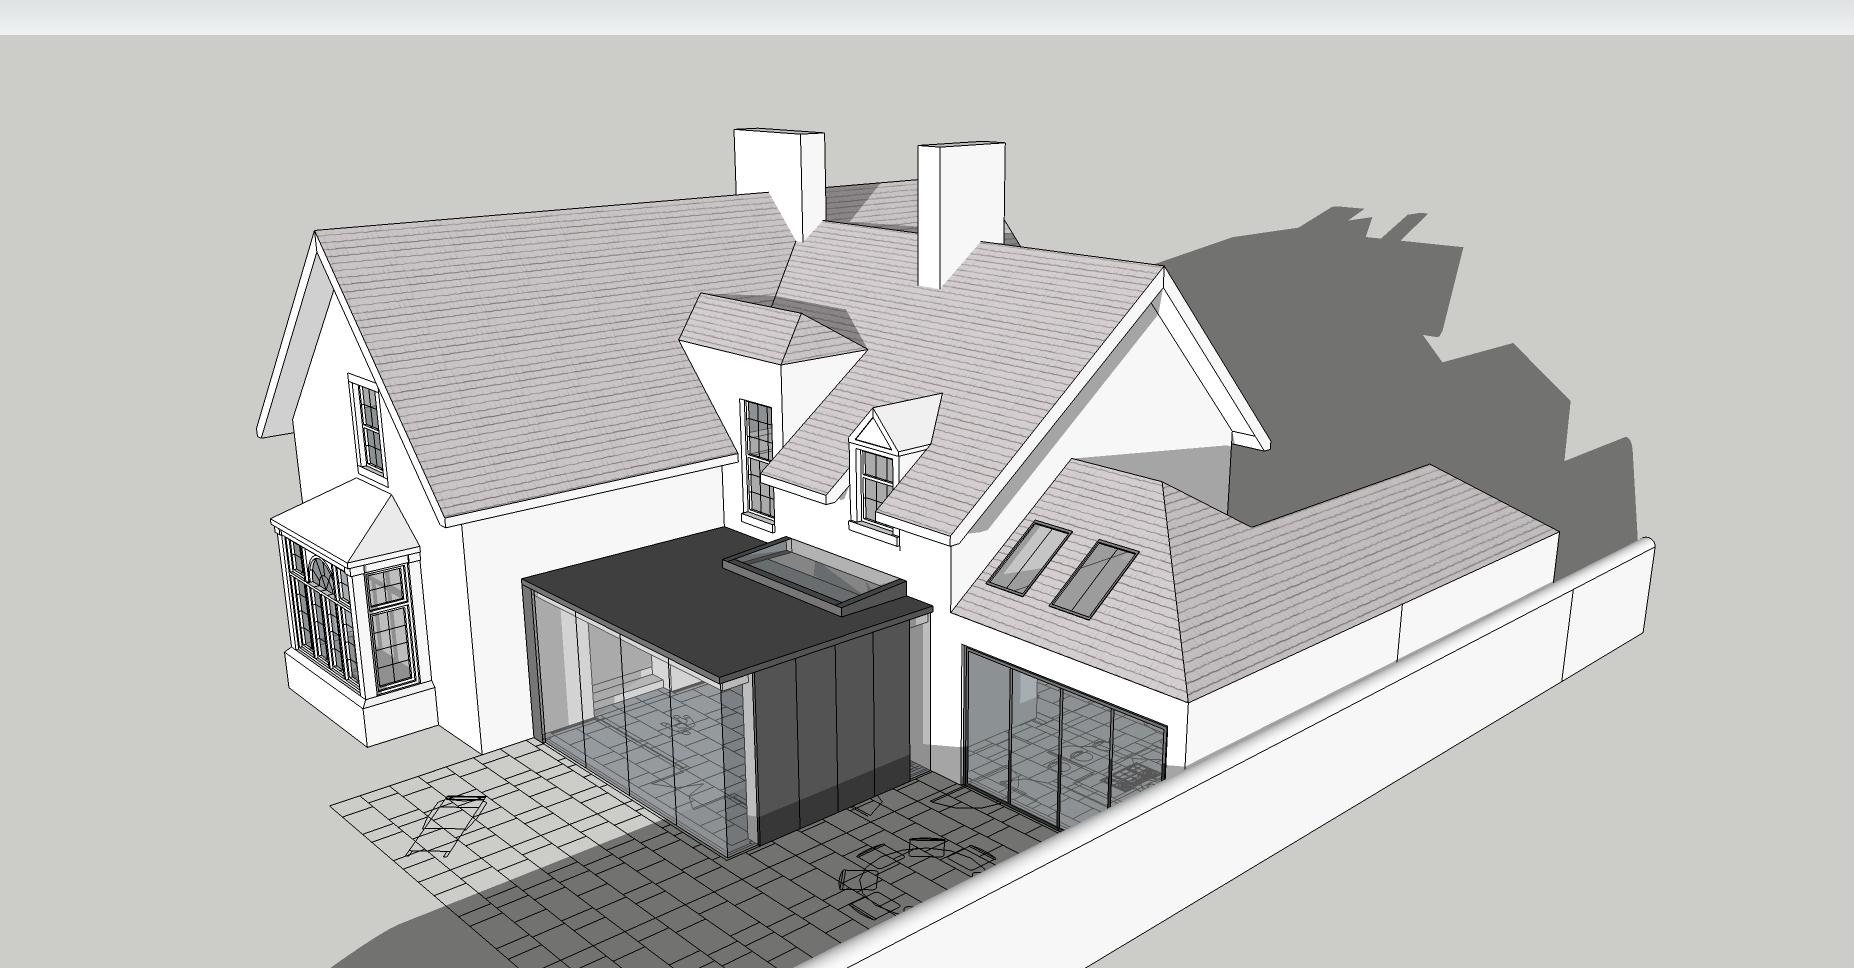 sketch up model existing opt 13 5.jpg